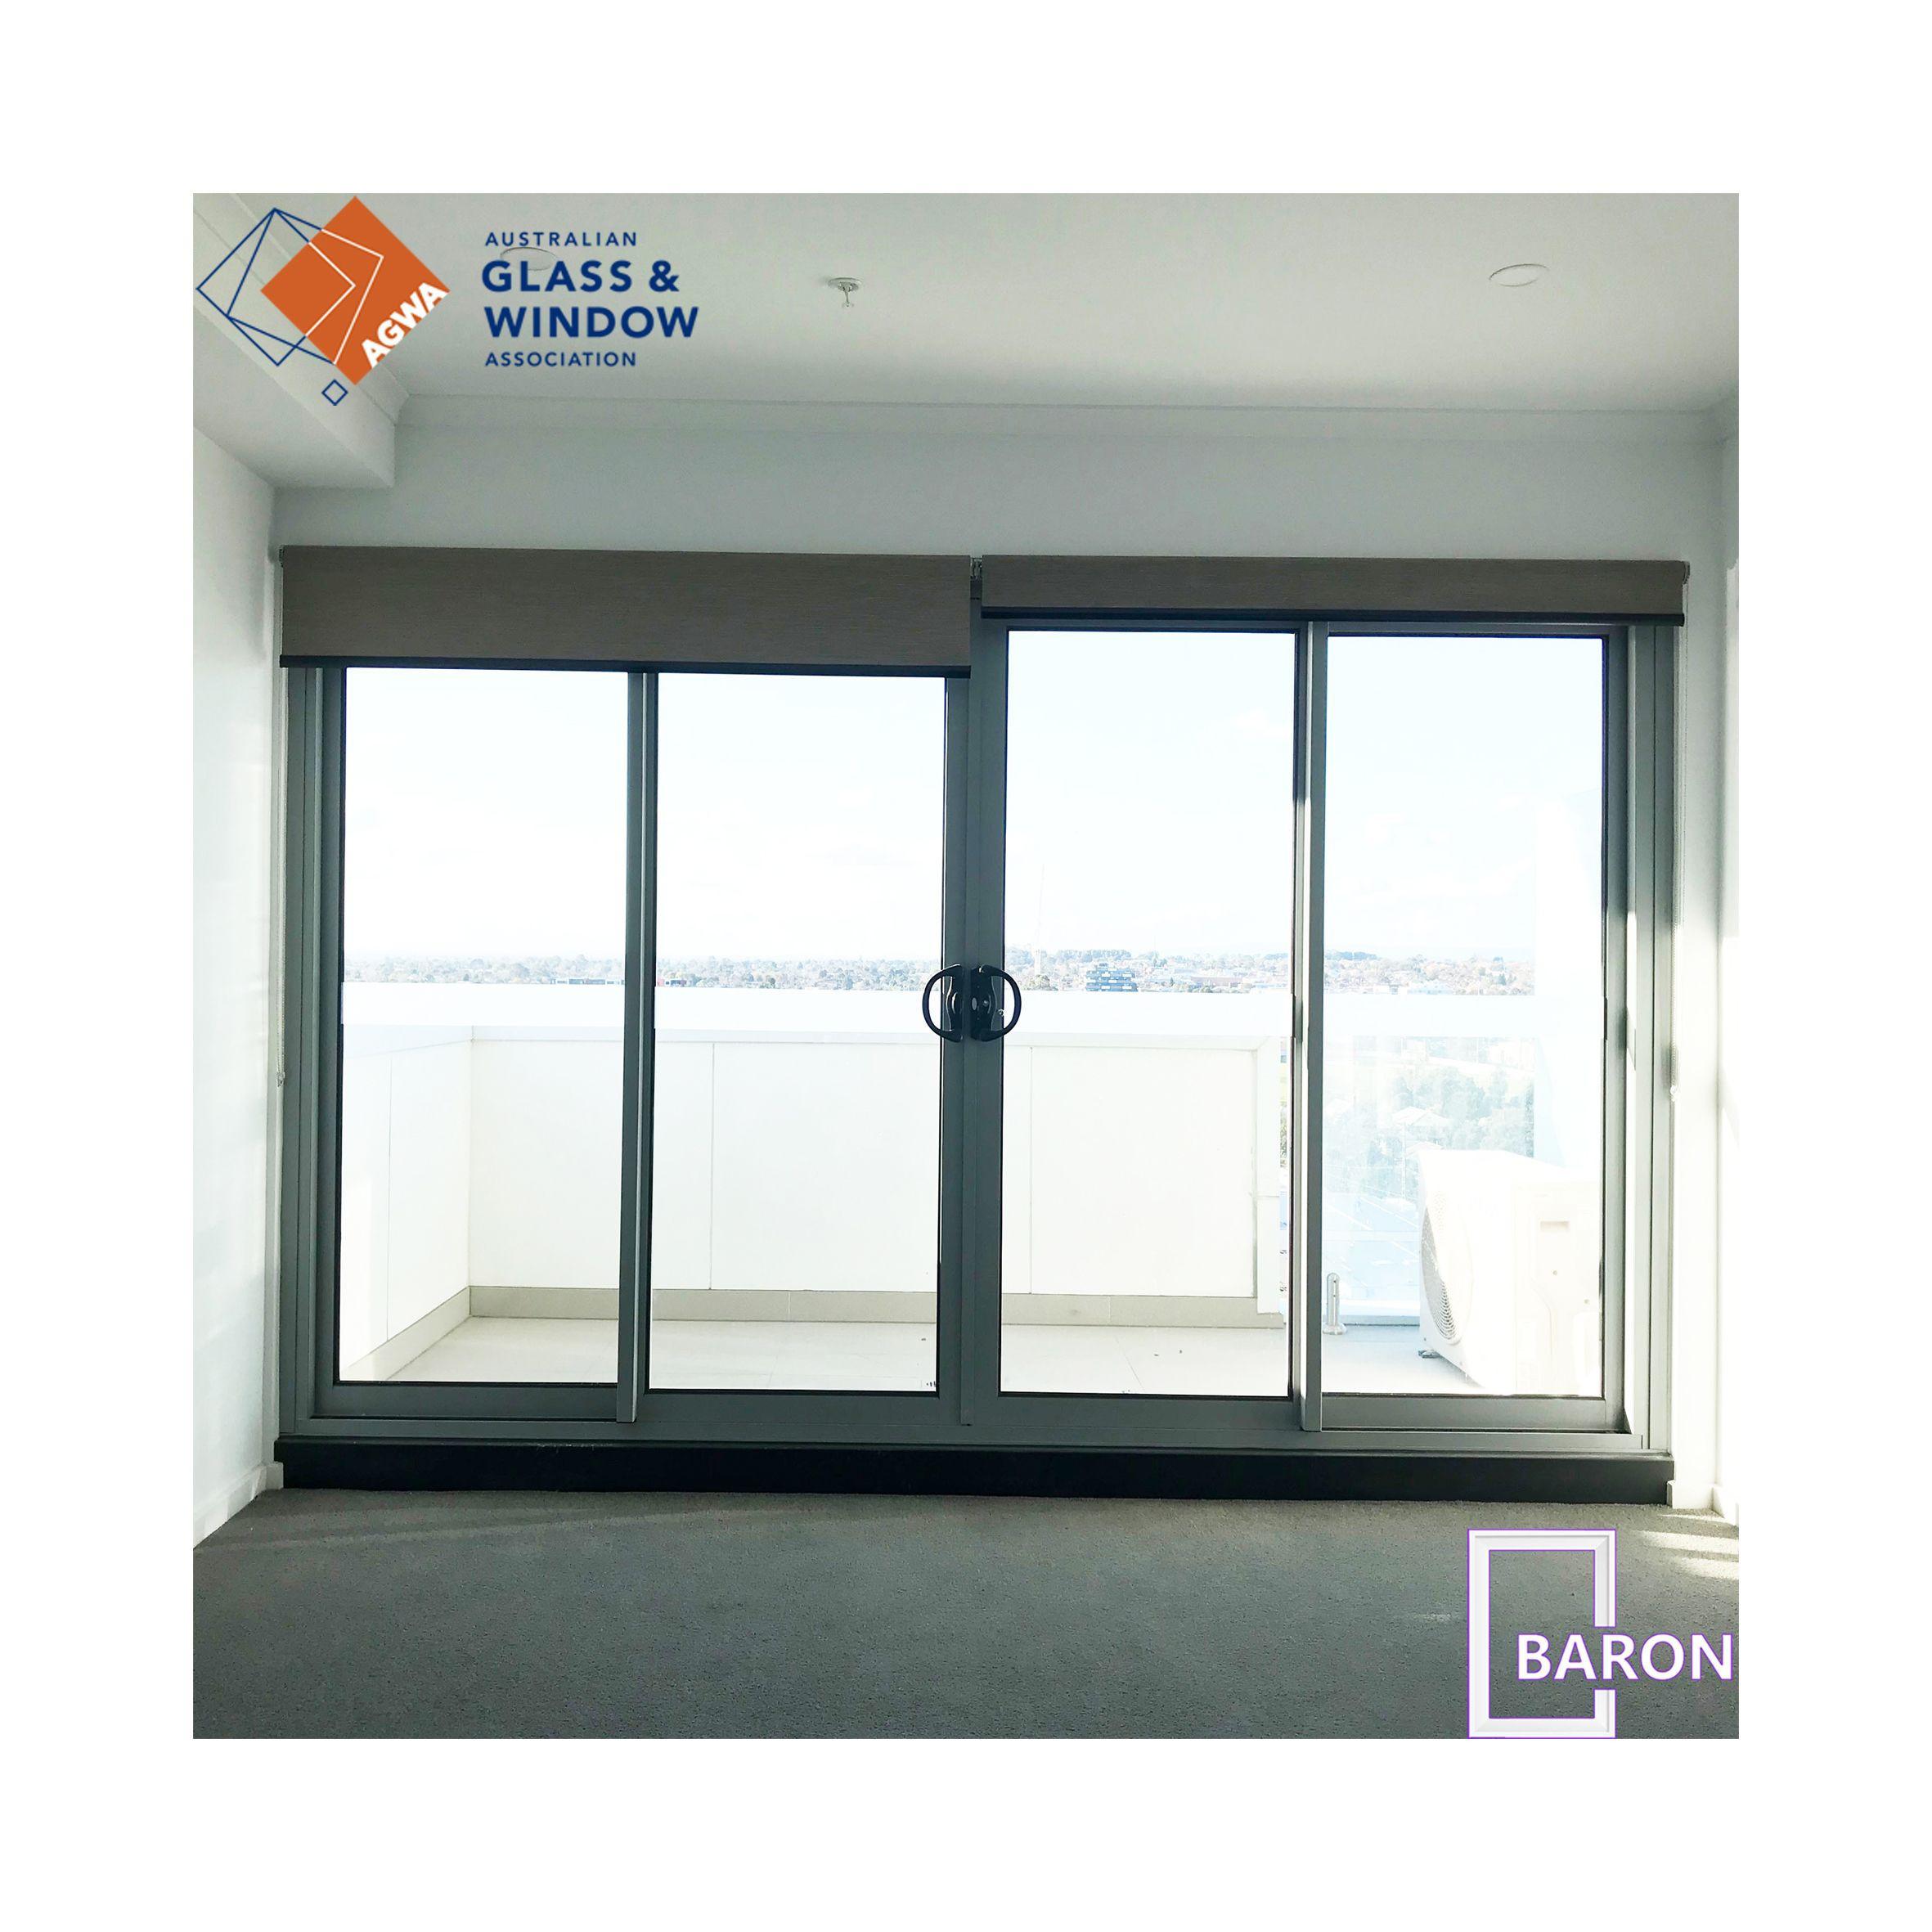 BARON member of Australian Glass & Window Association supply Australian standards double glazed aluminum sliding doors & windows